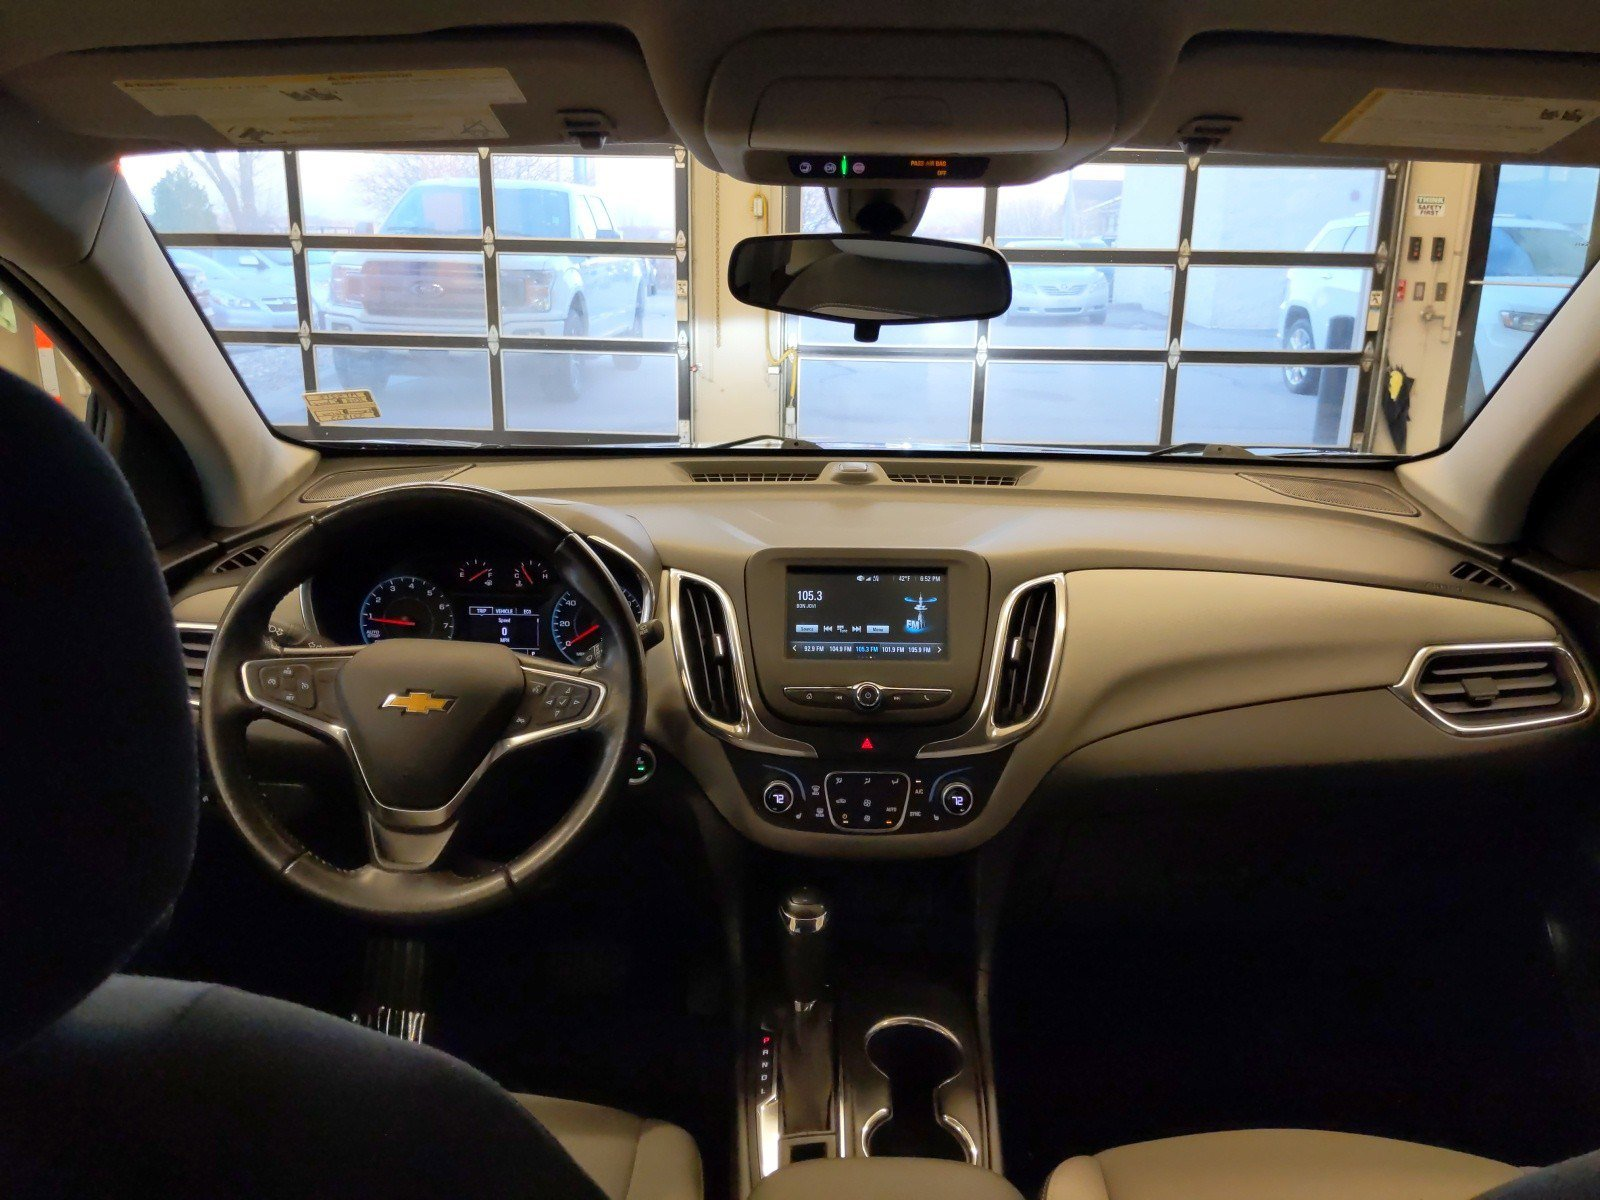 Used 2018 Chevrolet Equinox LT Sport Utility for sale in Lincoln NE